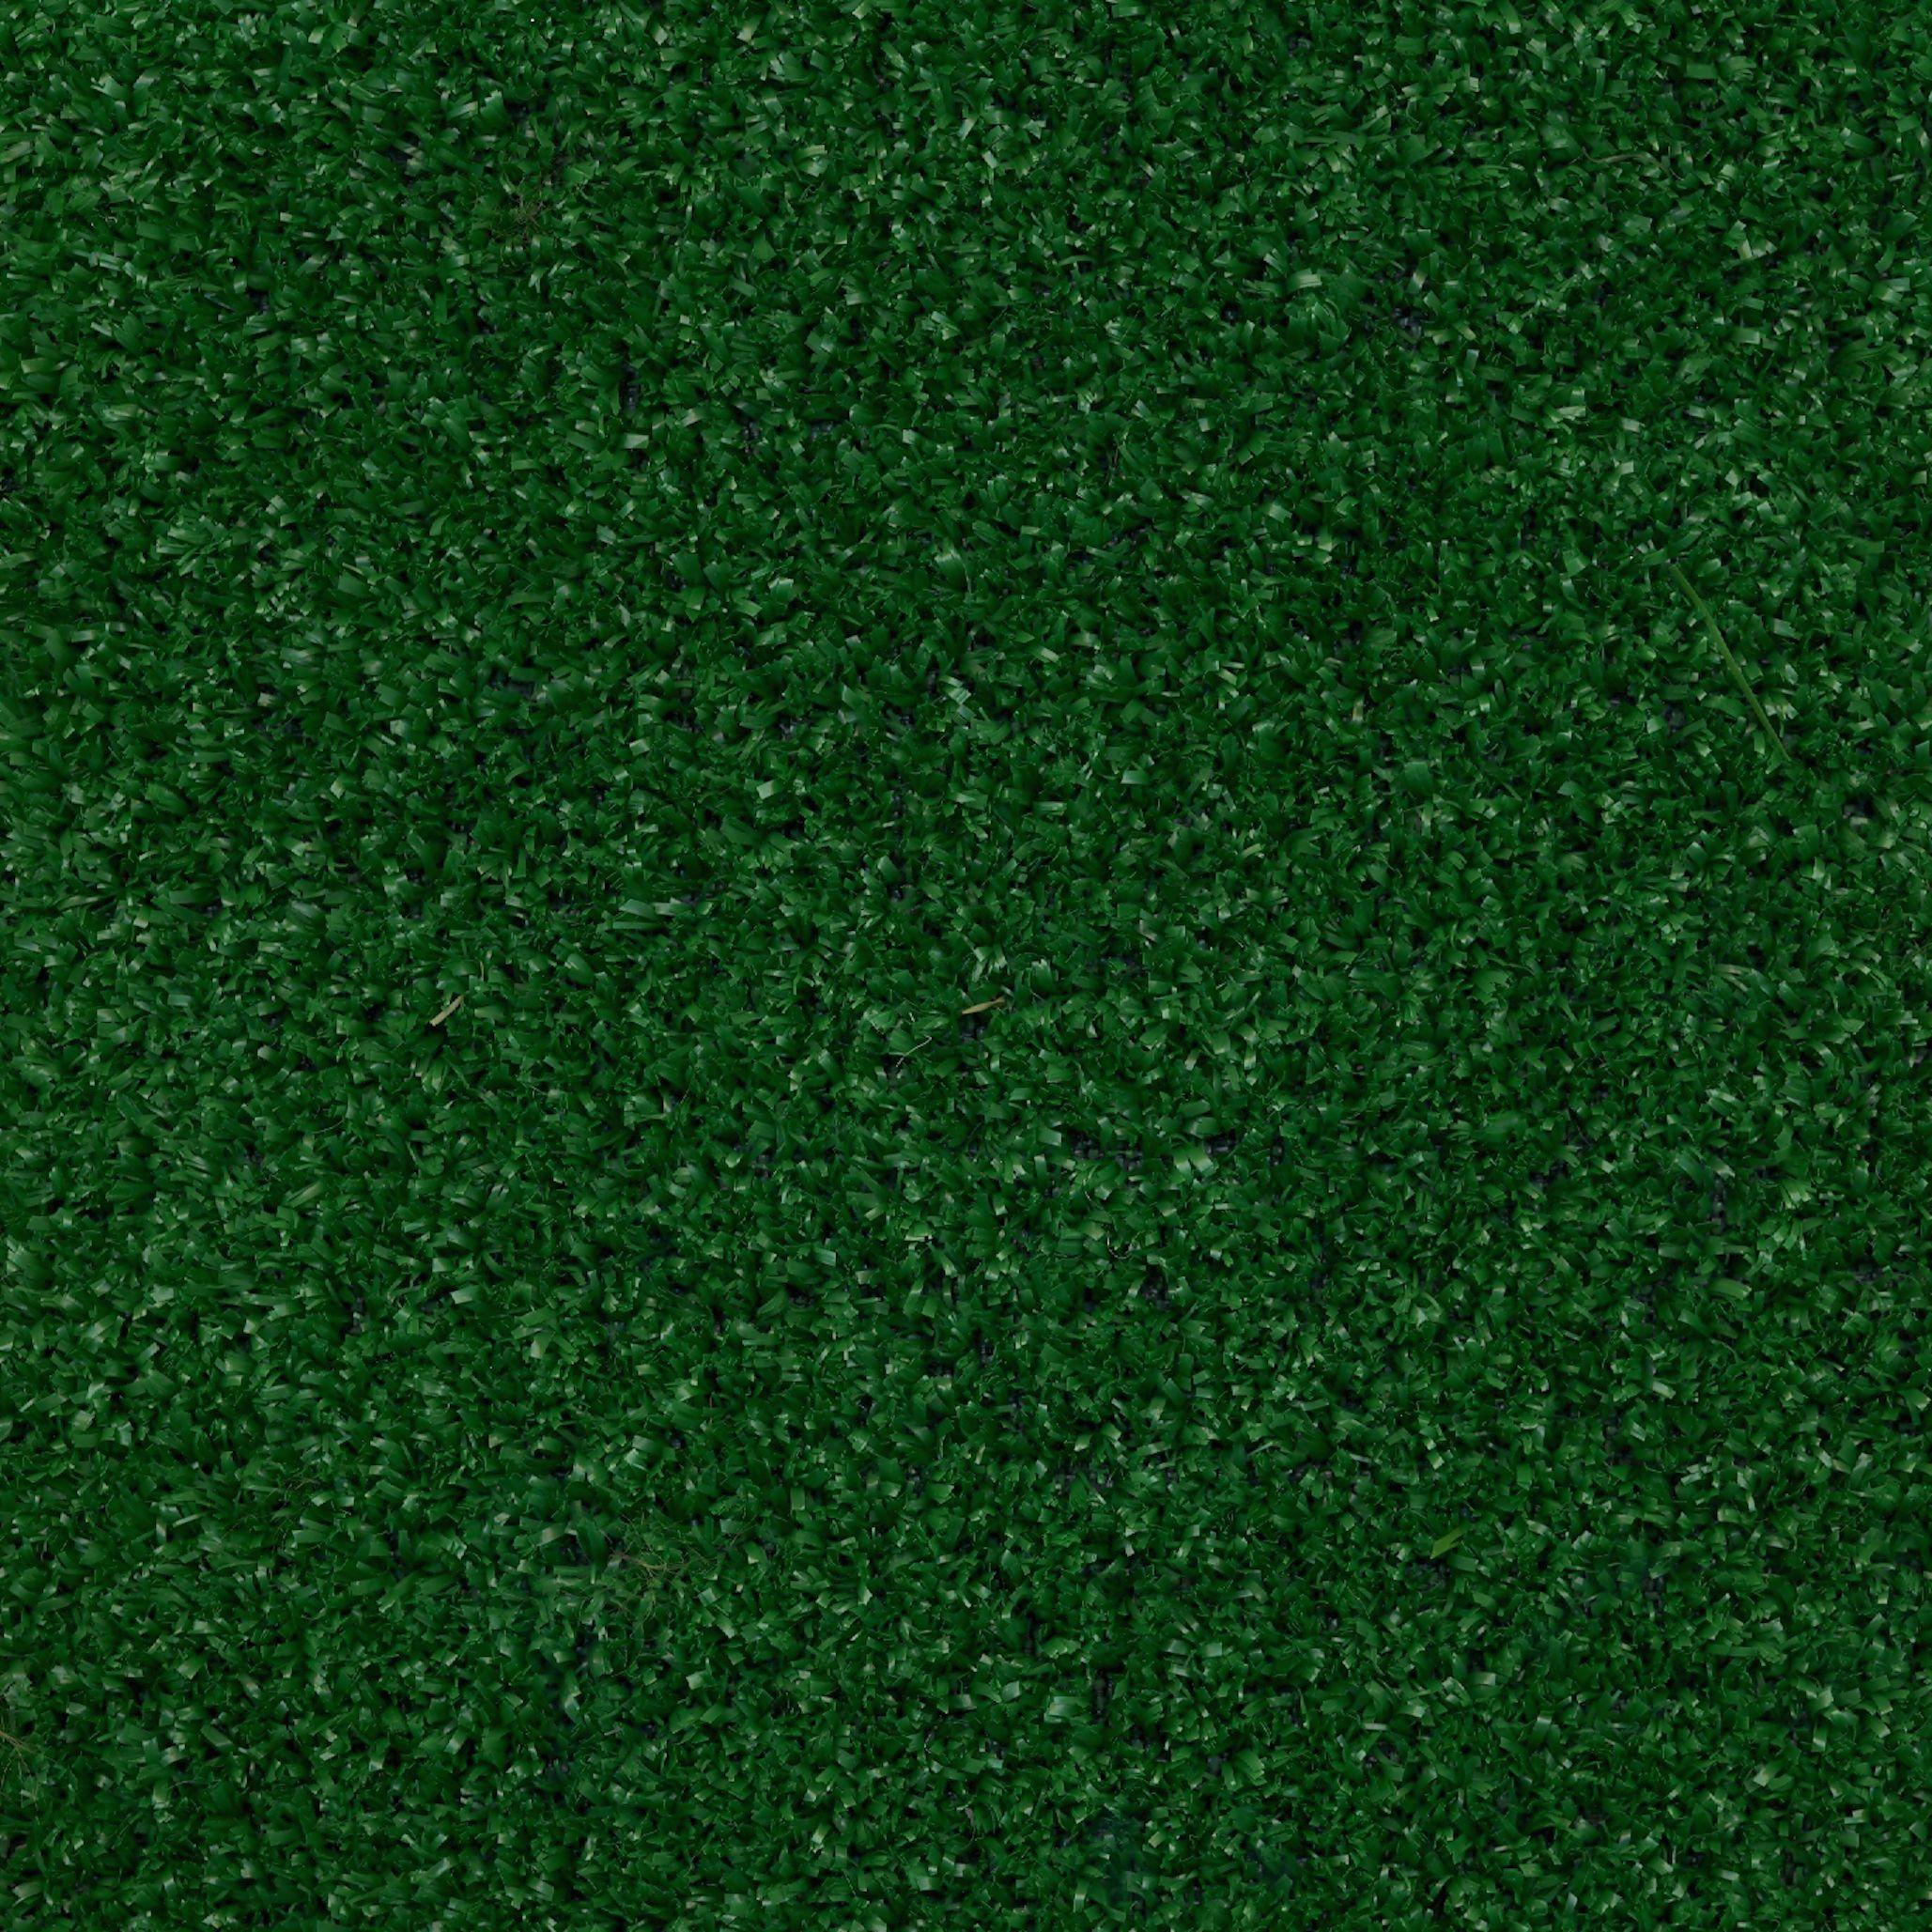 Padstow Low Density Artificial Grass W 2 M X L 2m X T 6